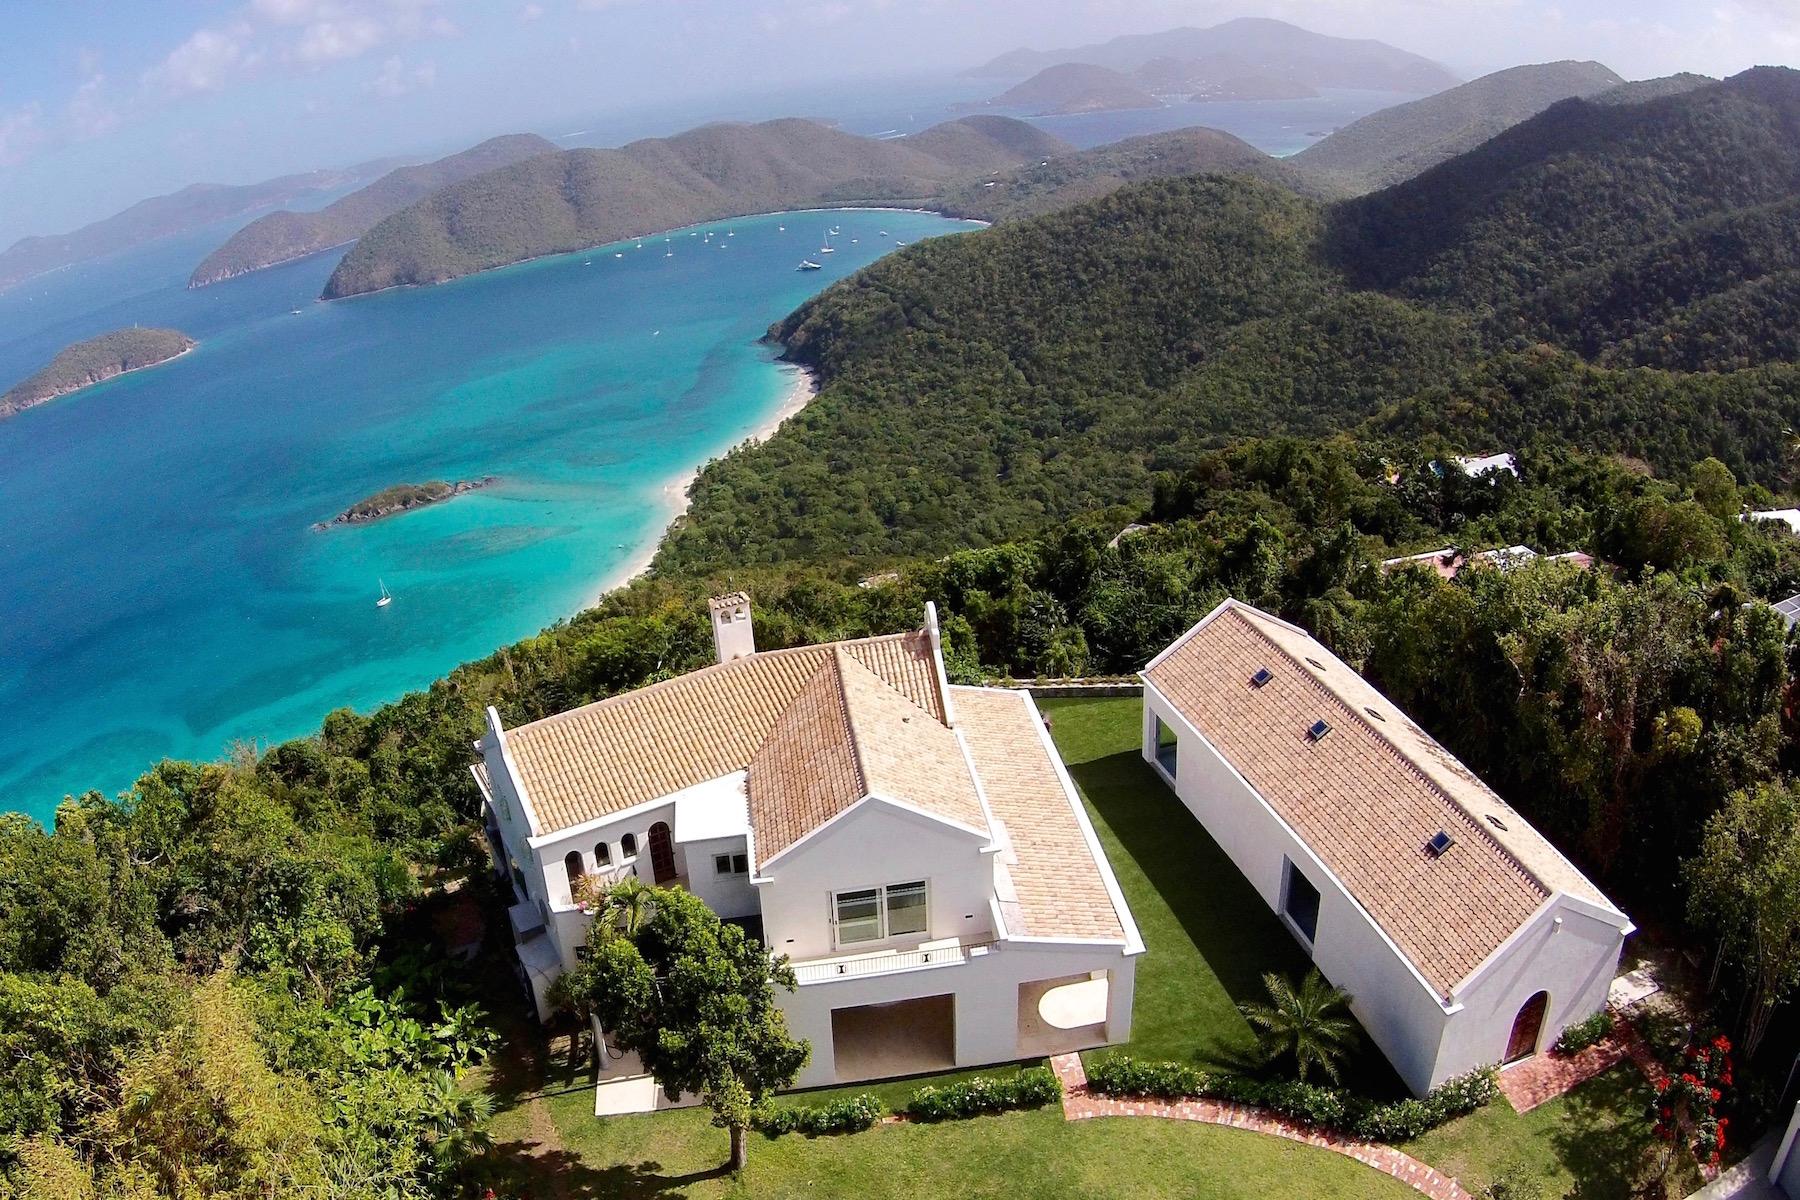 Single Family Homes für Verkauf beim Le Chateau 3-1 Catherineberg St John, Virgin Islands 00830 Amerikanische Jungferninseln